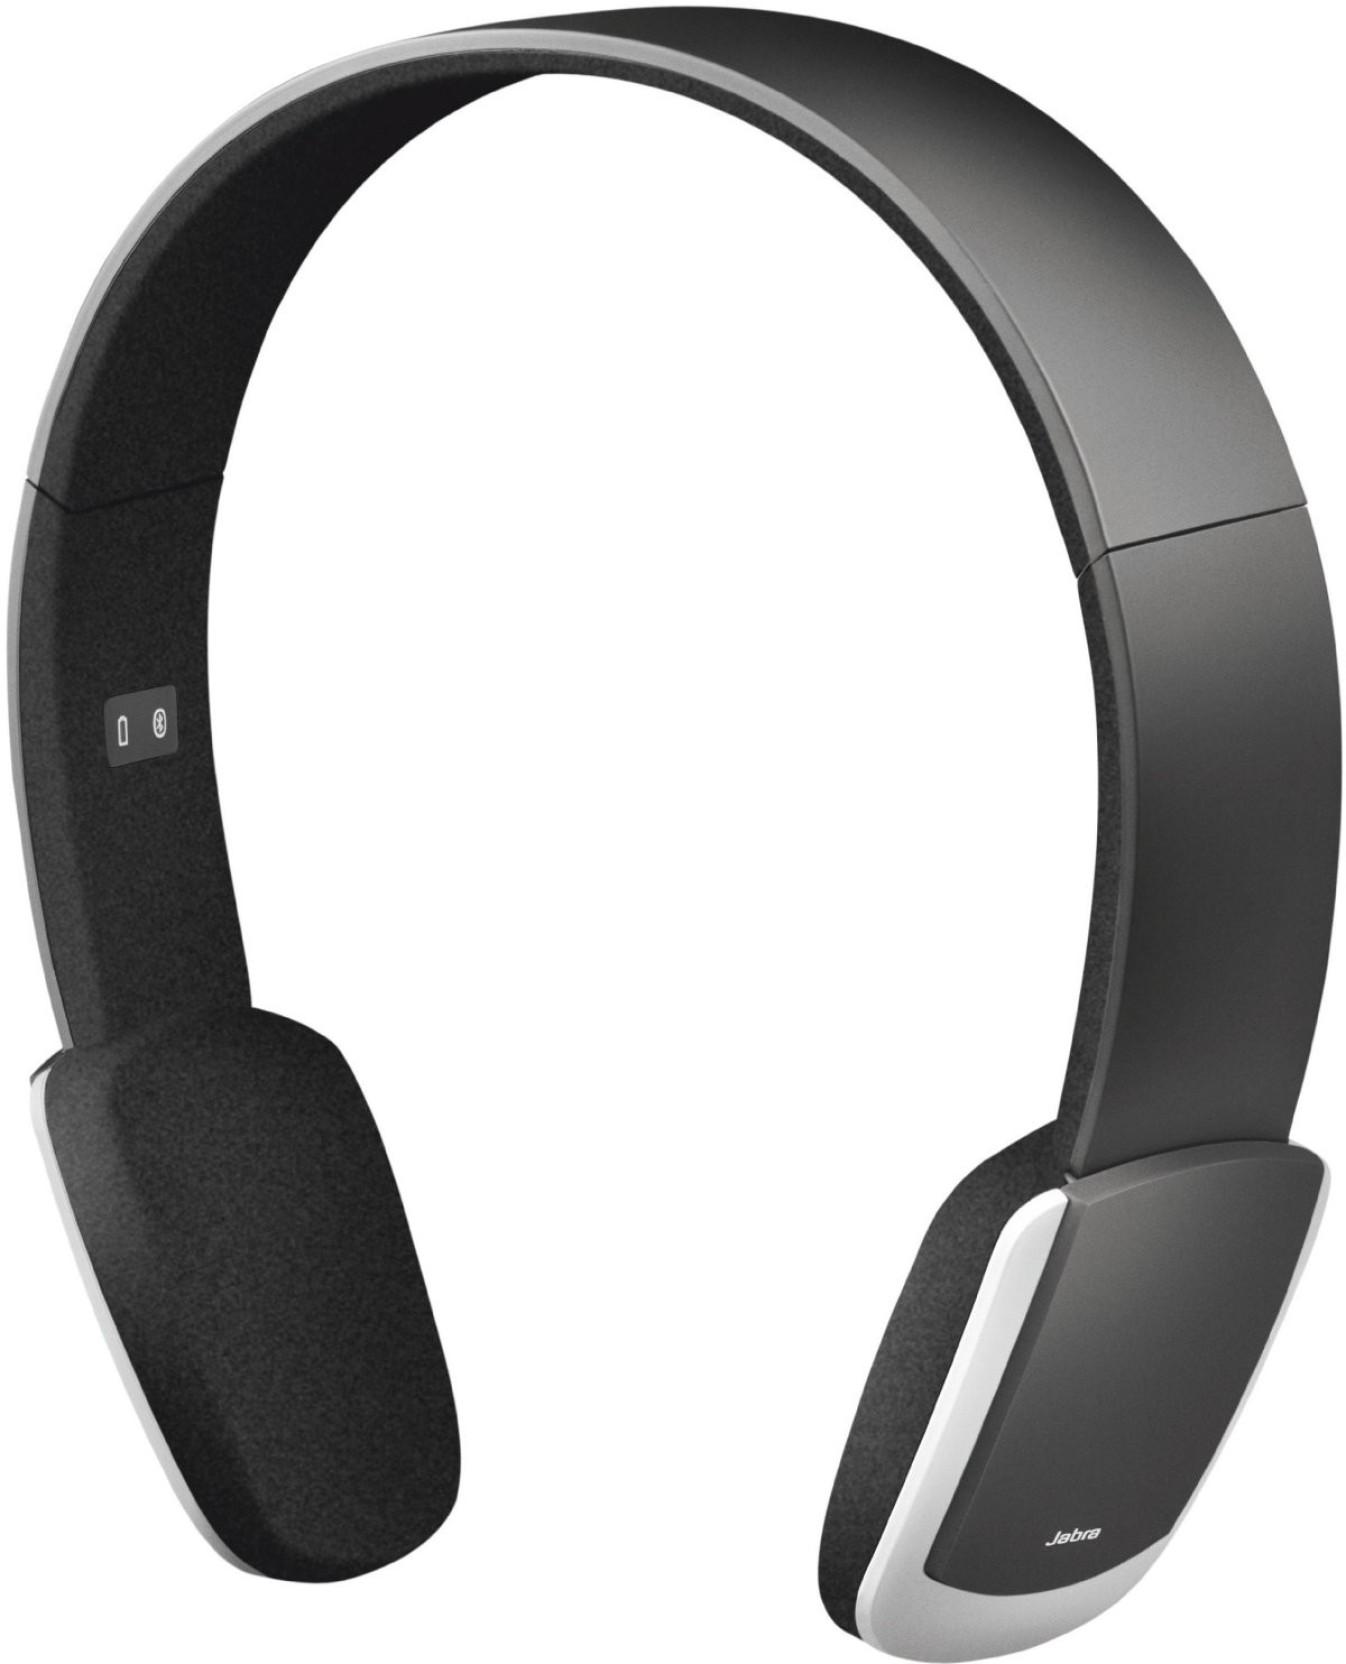 Jabra Halo 2 Wired & Wireless Bluetooth Headphone Price In India